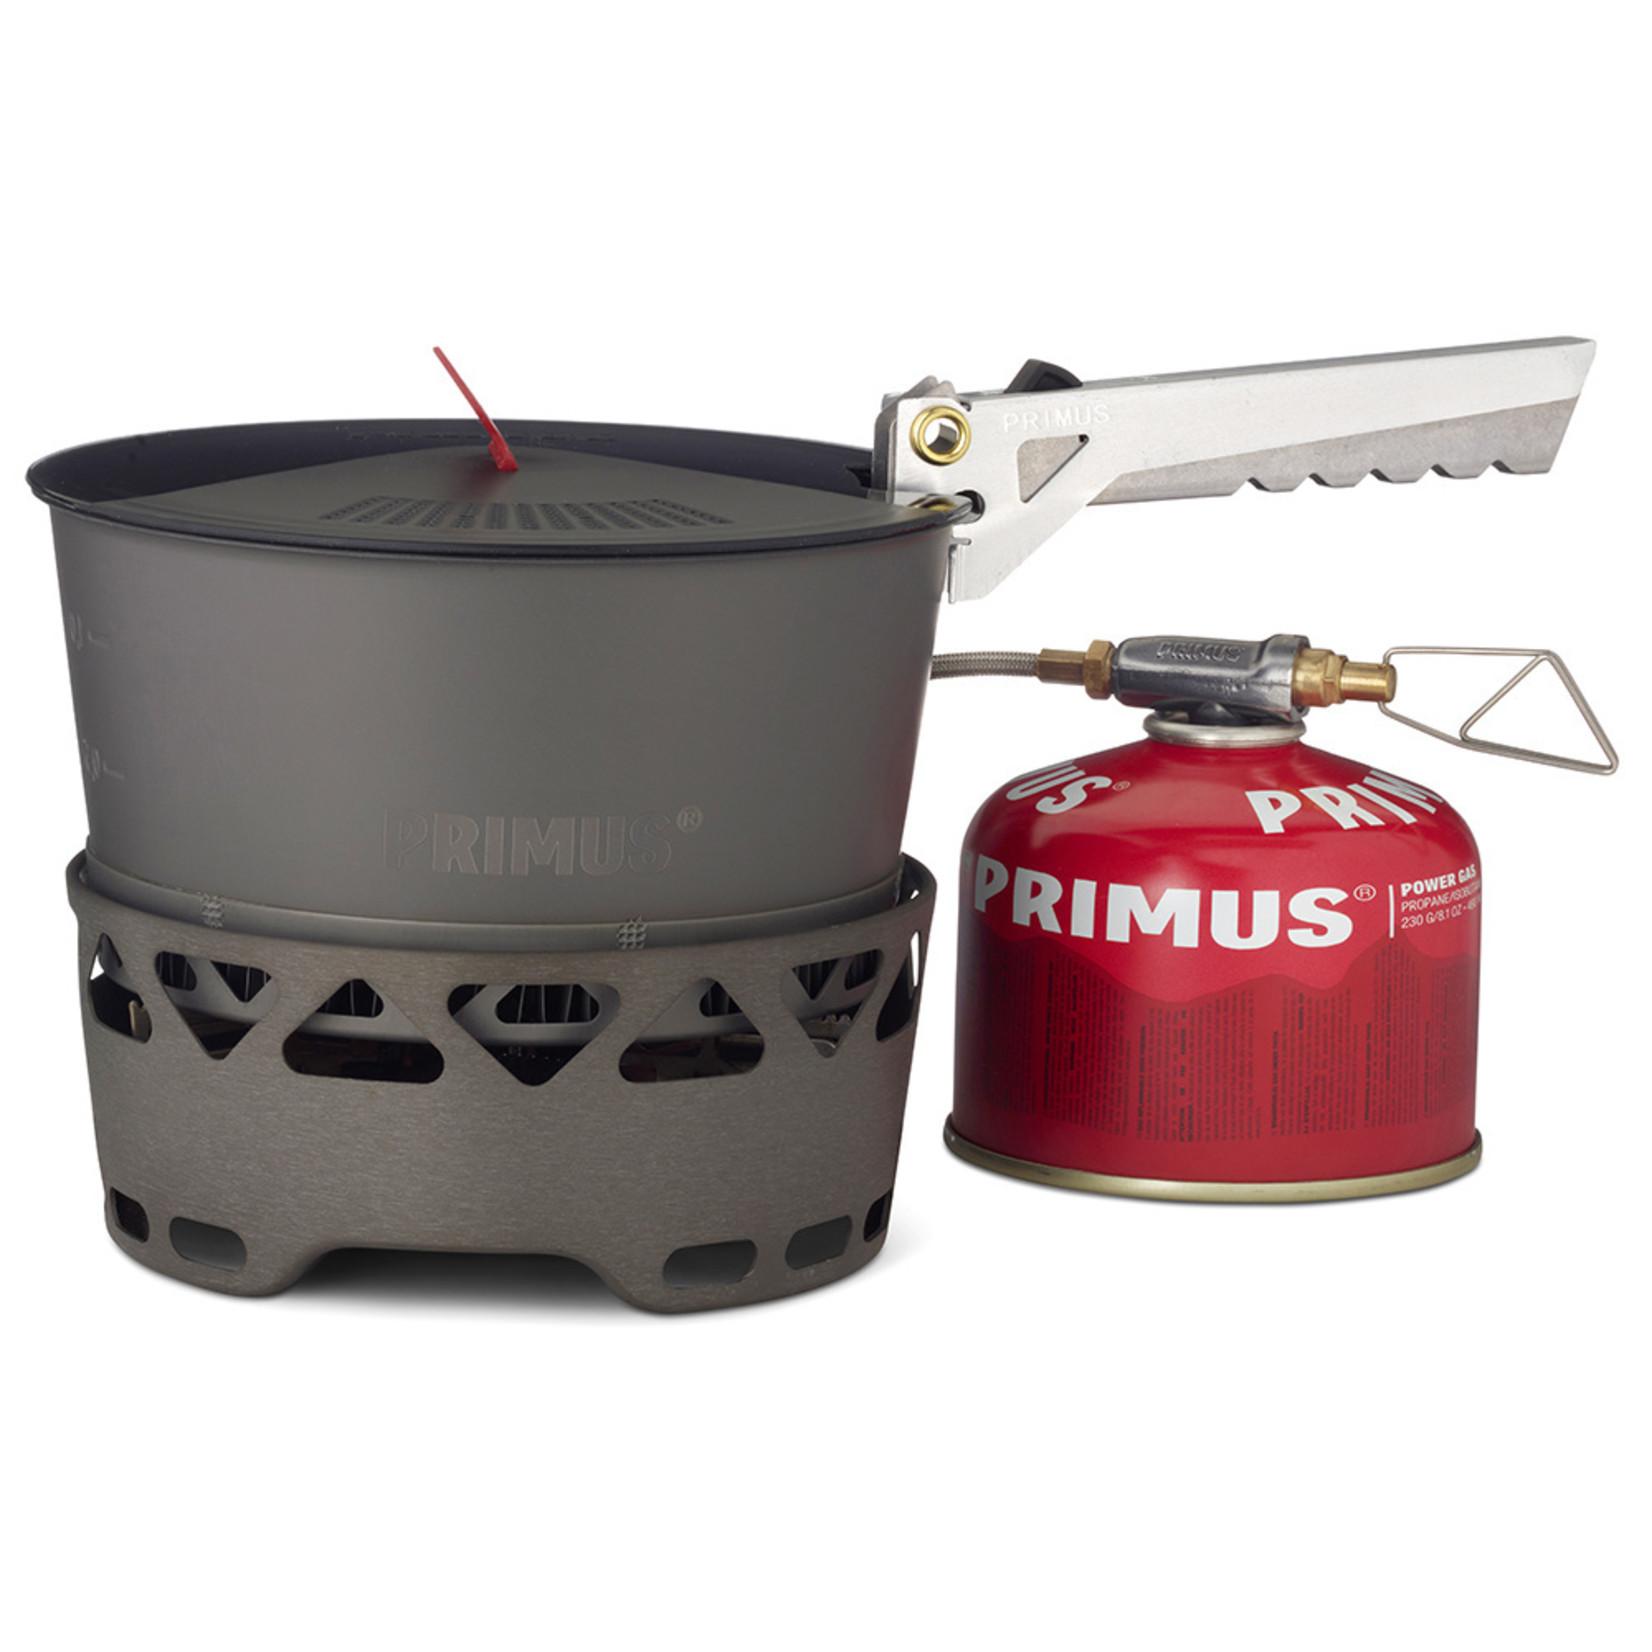 Primus Primus Primetech stove set 2,3 liter, 2 tot 5 personen